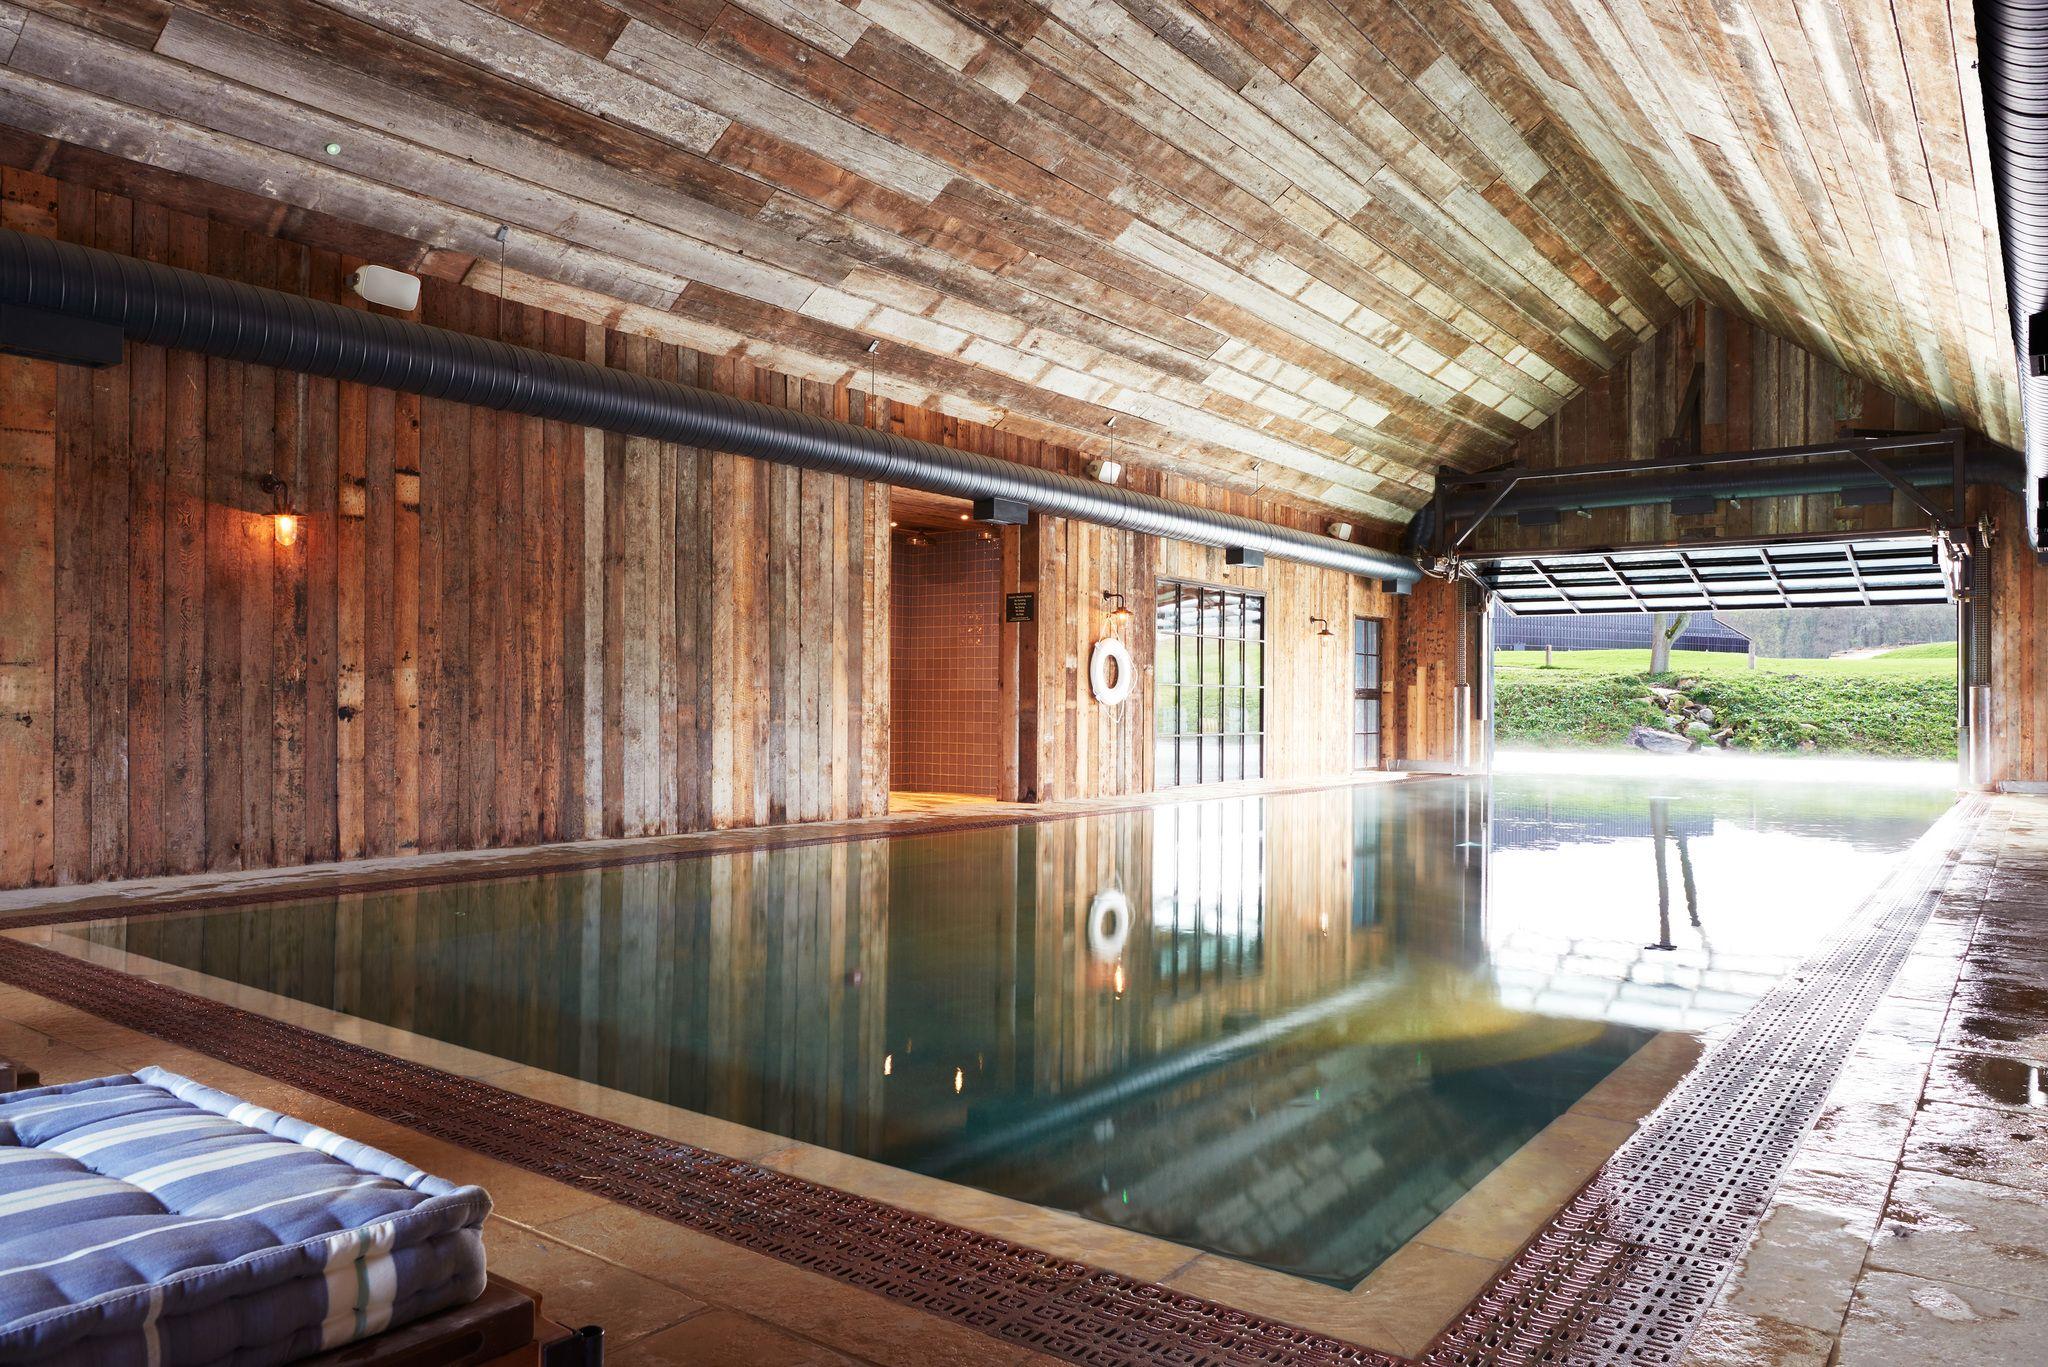 Copyright soho farm house boathouse 03 p o o l s for Farmhouse with swimming pool